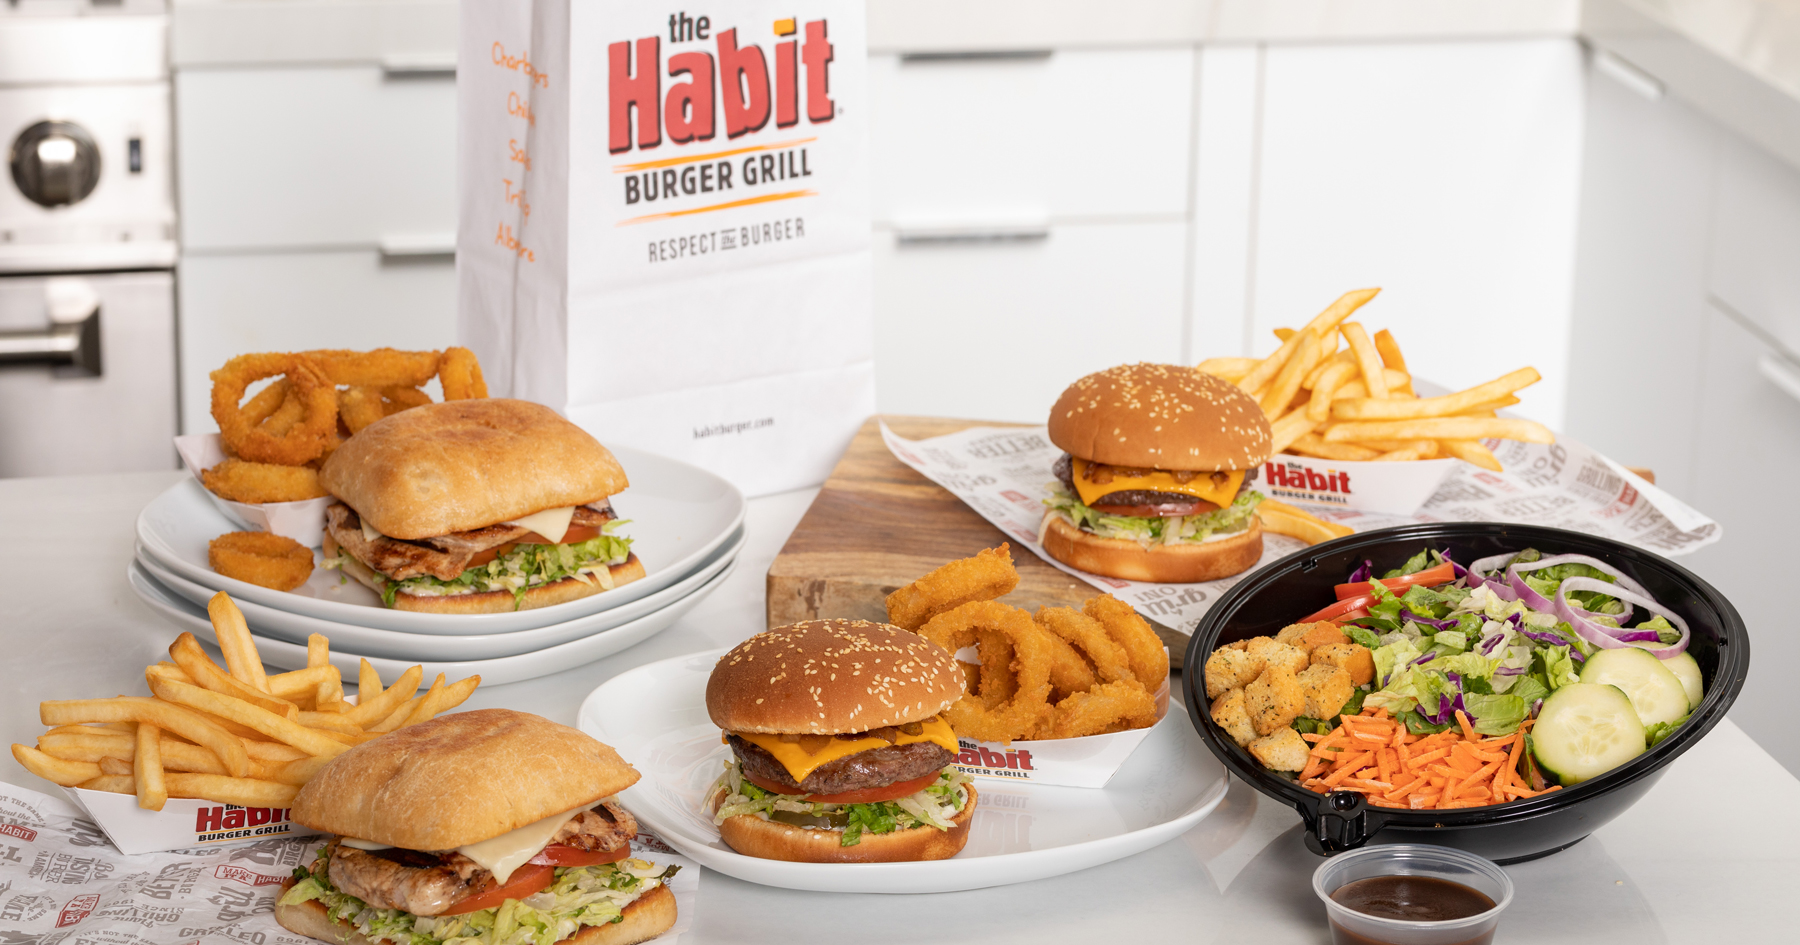 Habit Grill